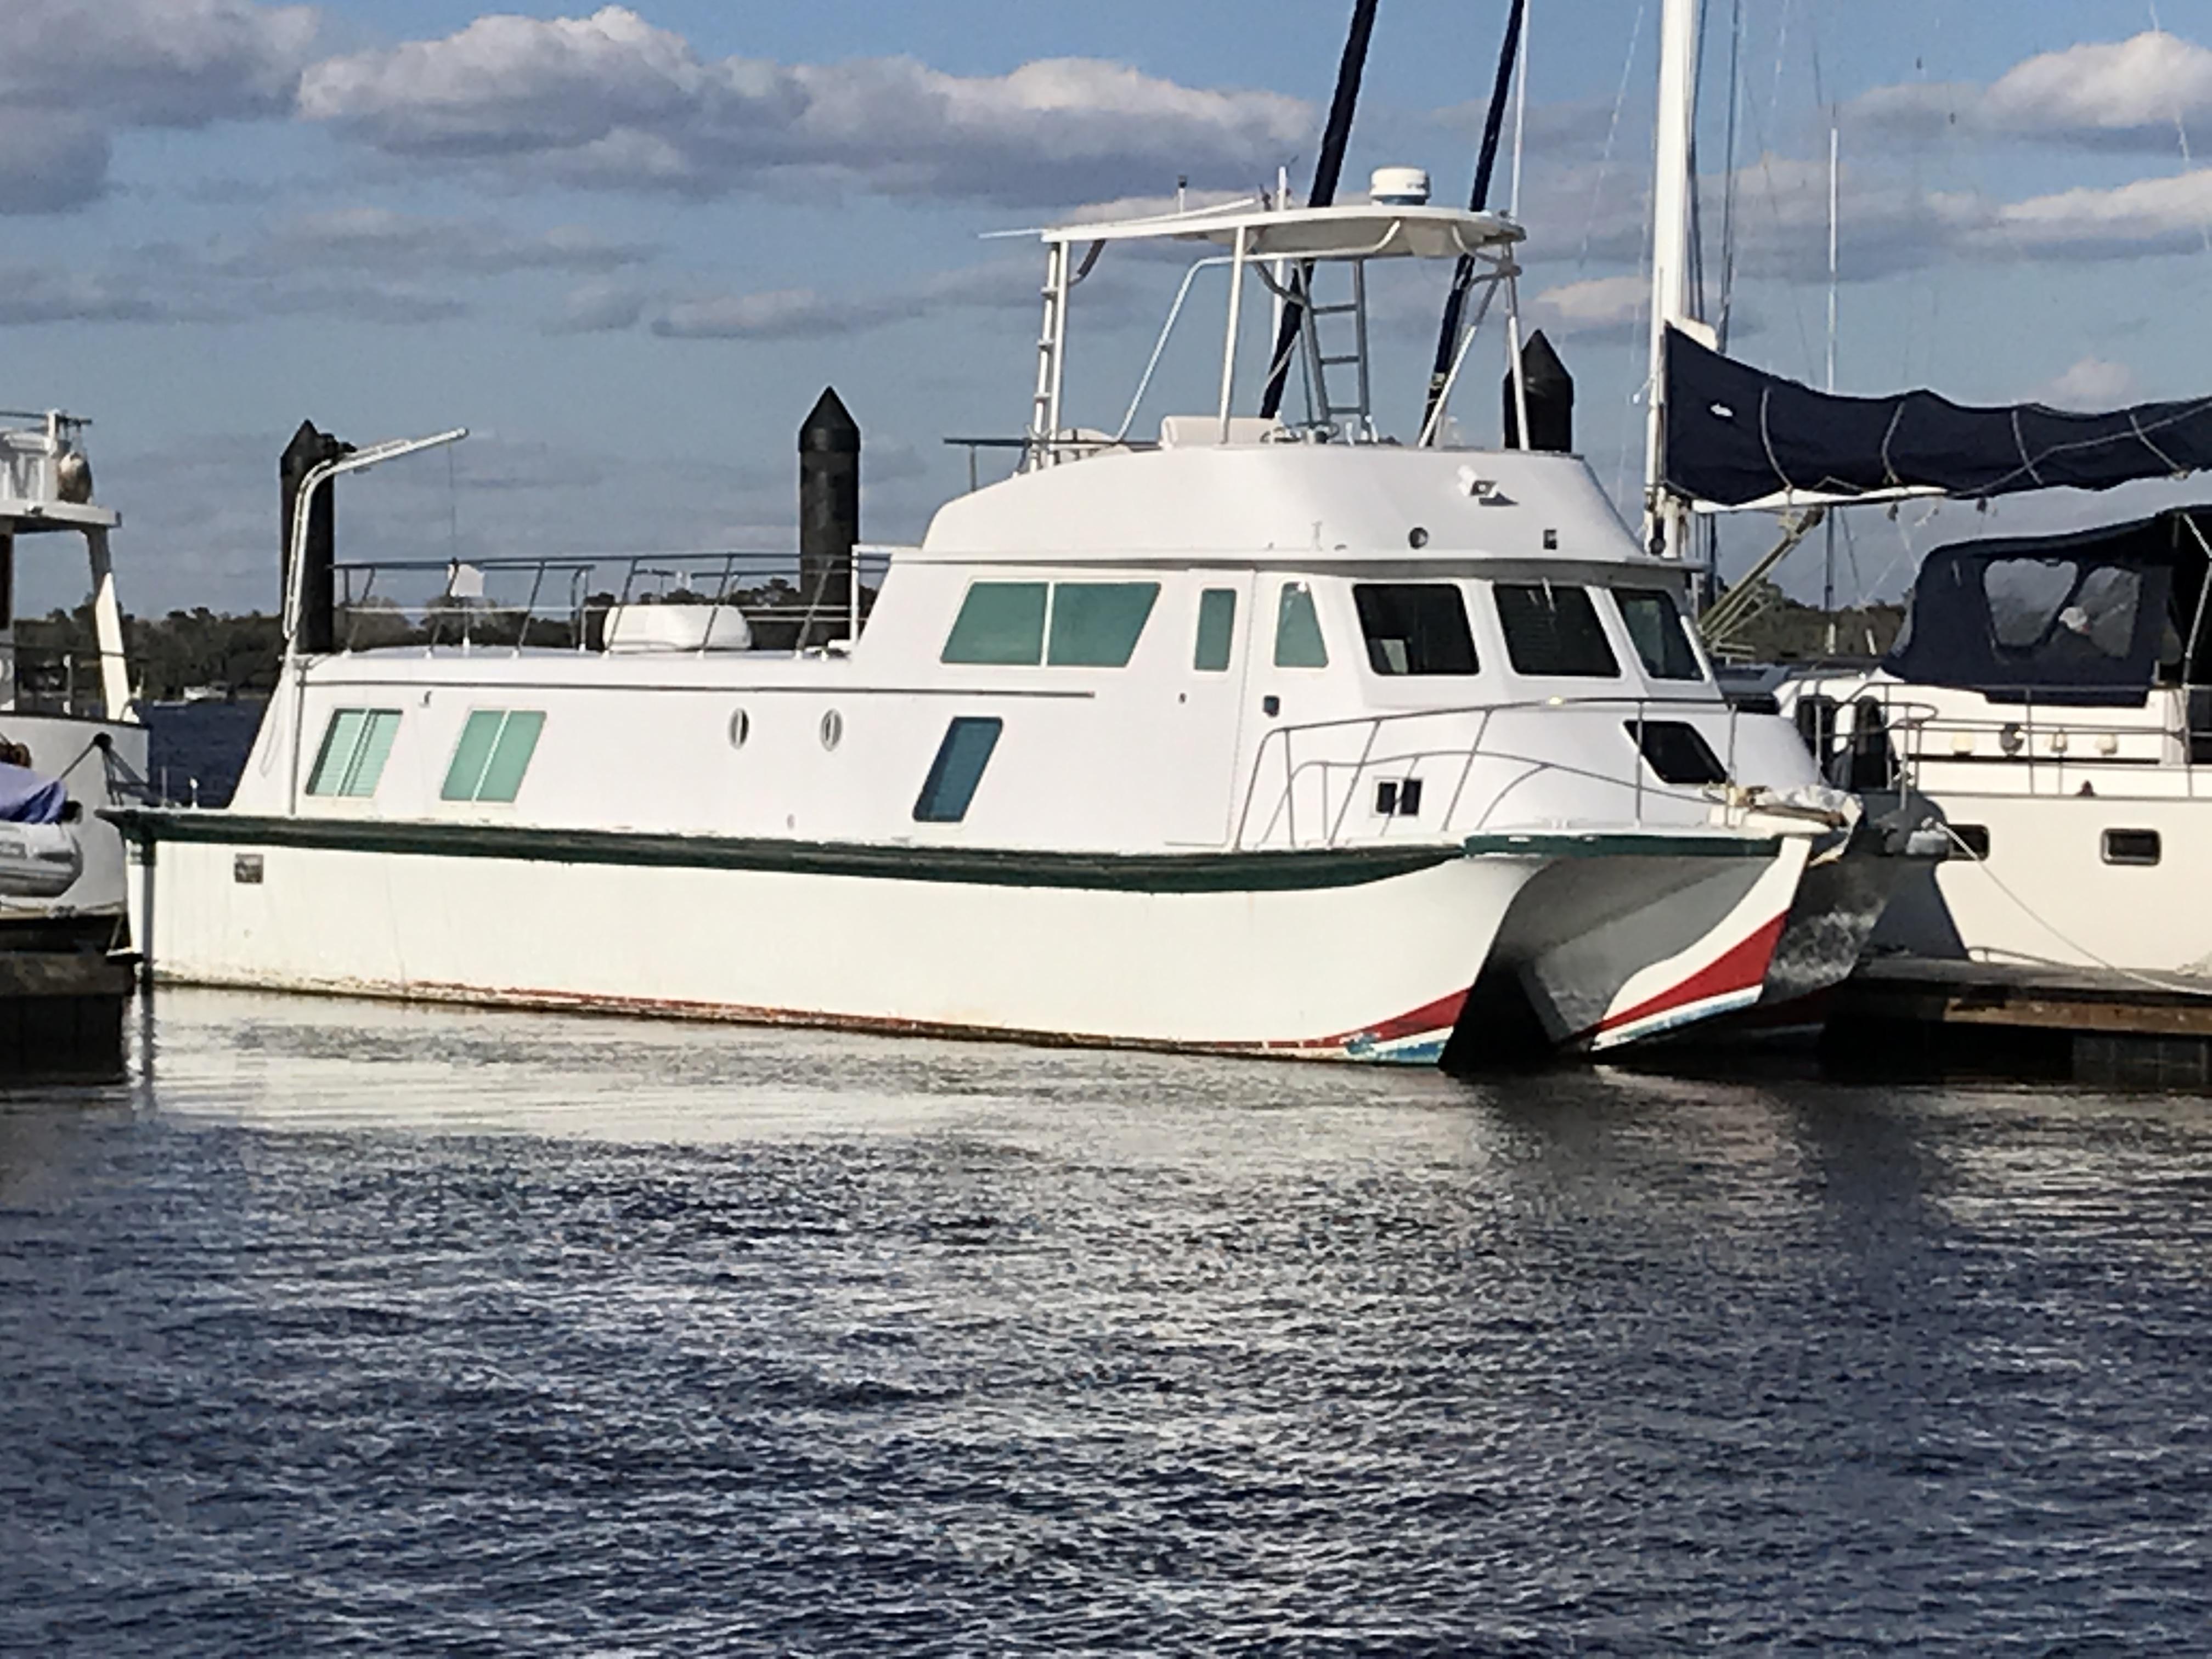 Carri-craft 57-ft Power Catamaran - 1971 Carri-Craft 57 Cruis-Ader power catamaran